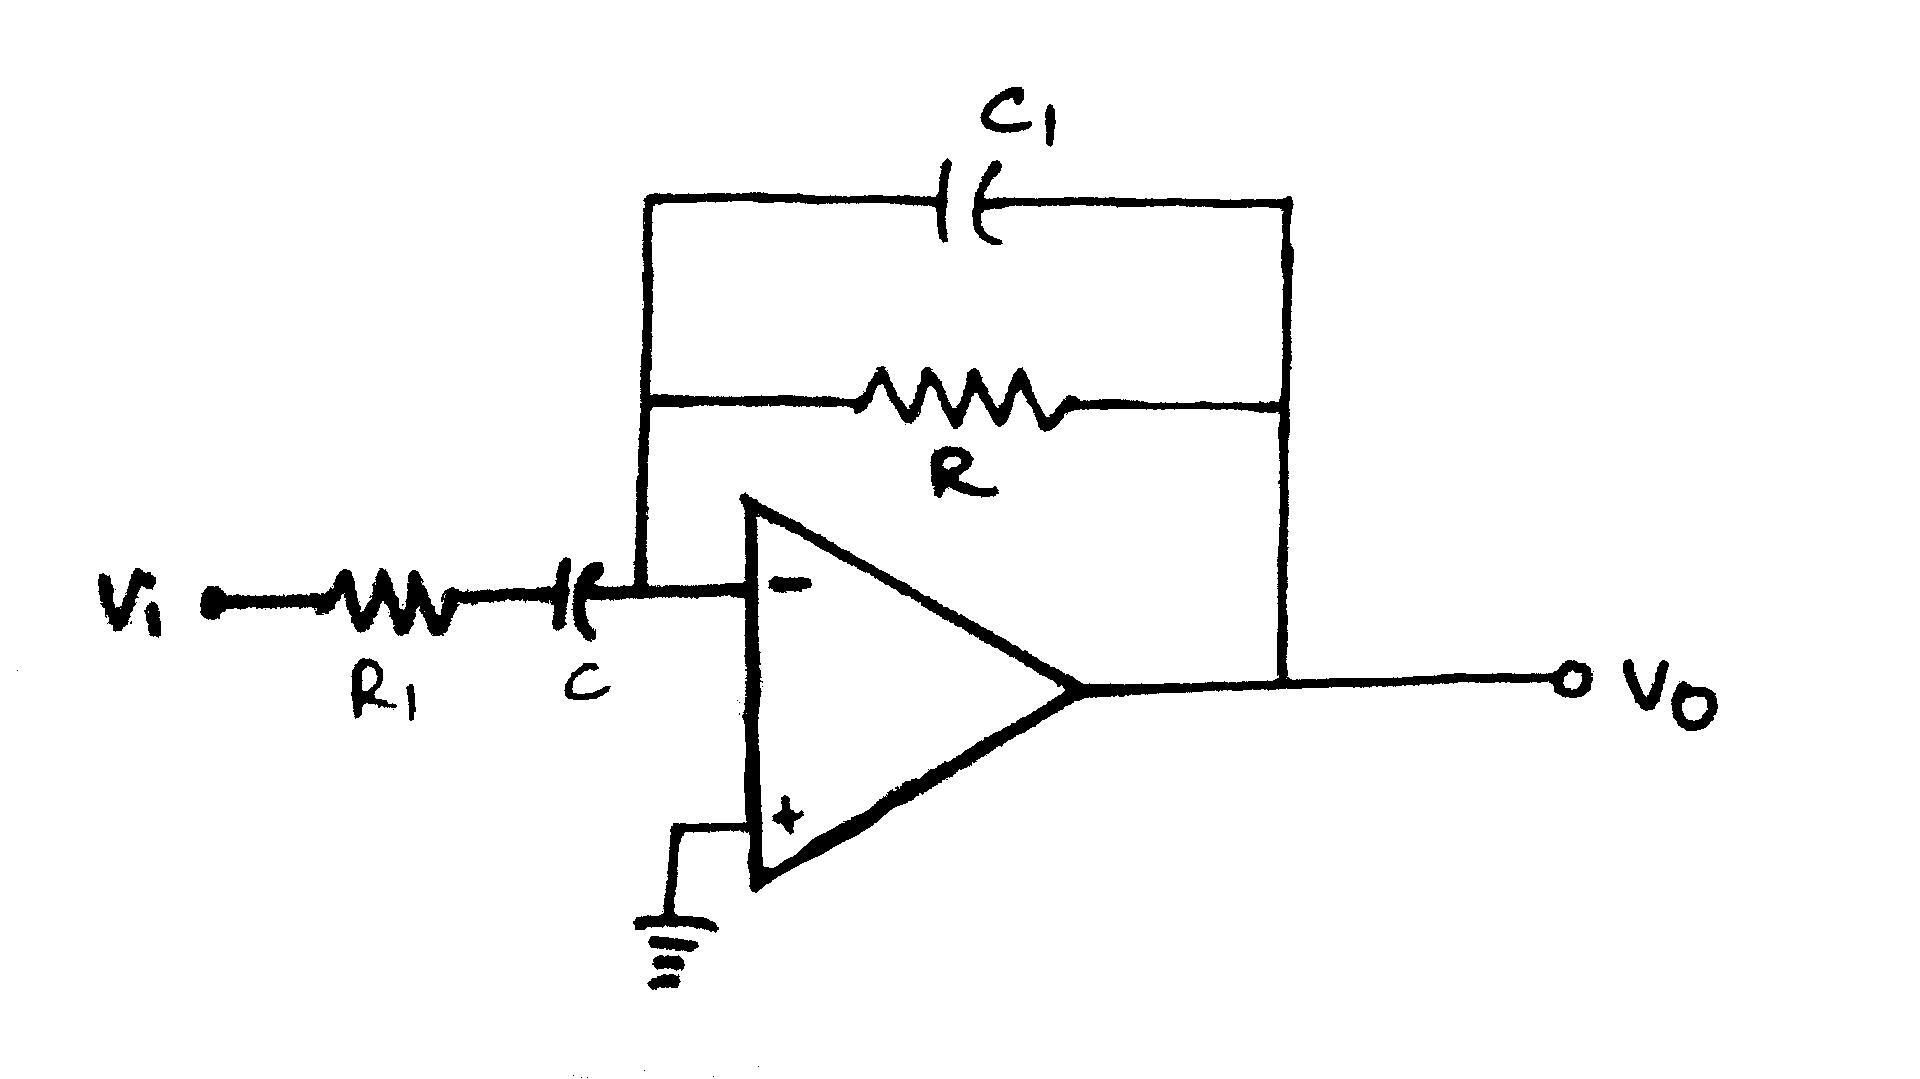 File:Practical Differentiator Circuit Diagram png